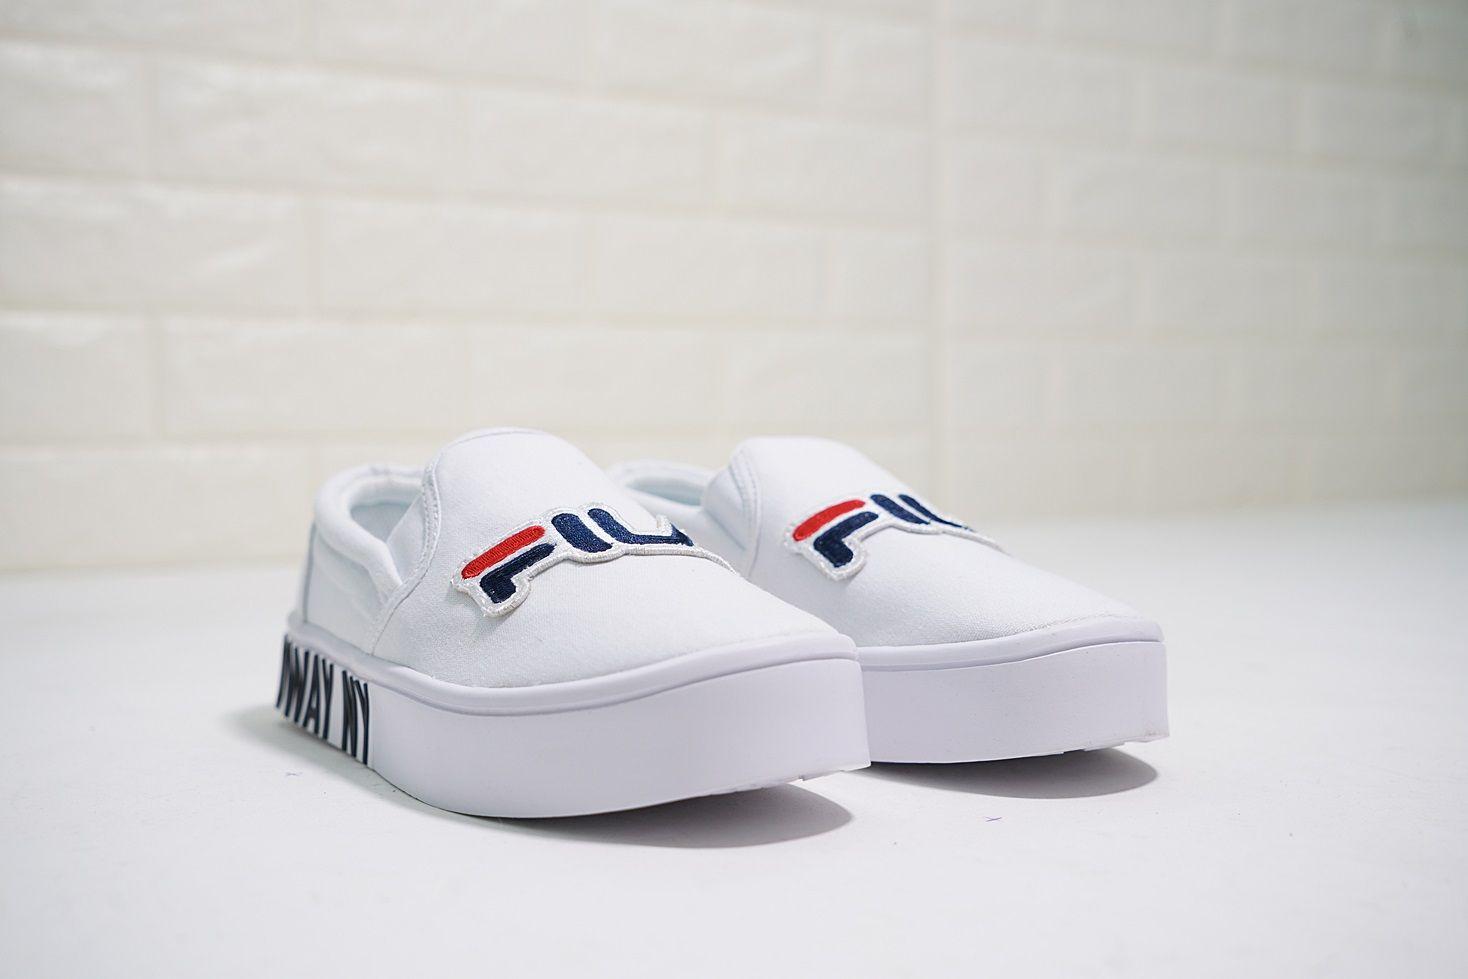 Fila Court Slip On White dark blue red Women's Canvas Shoes